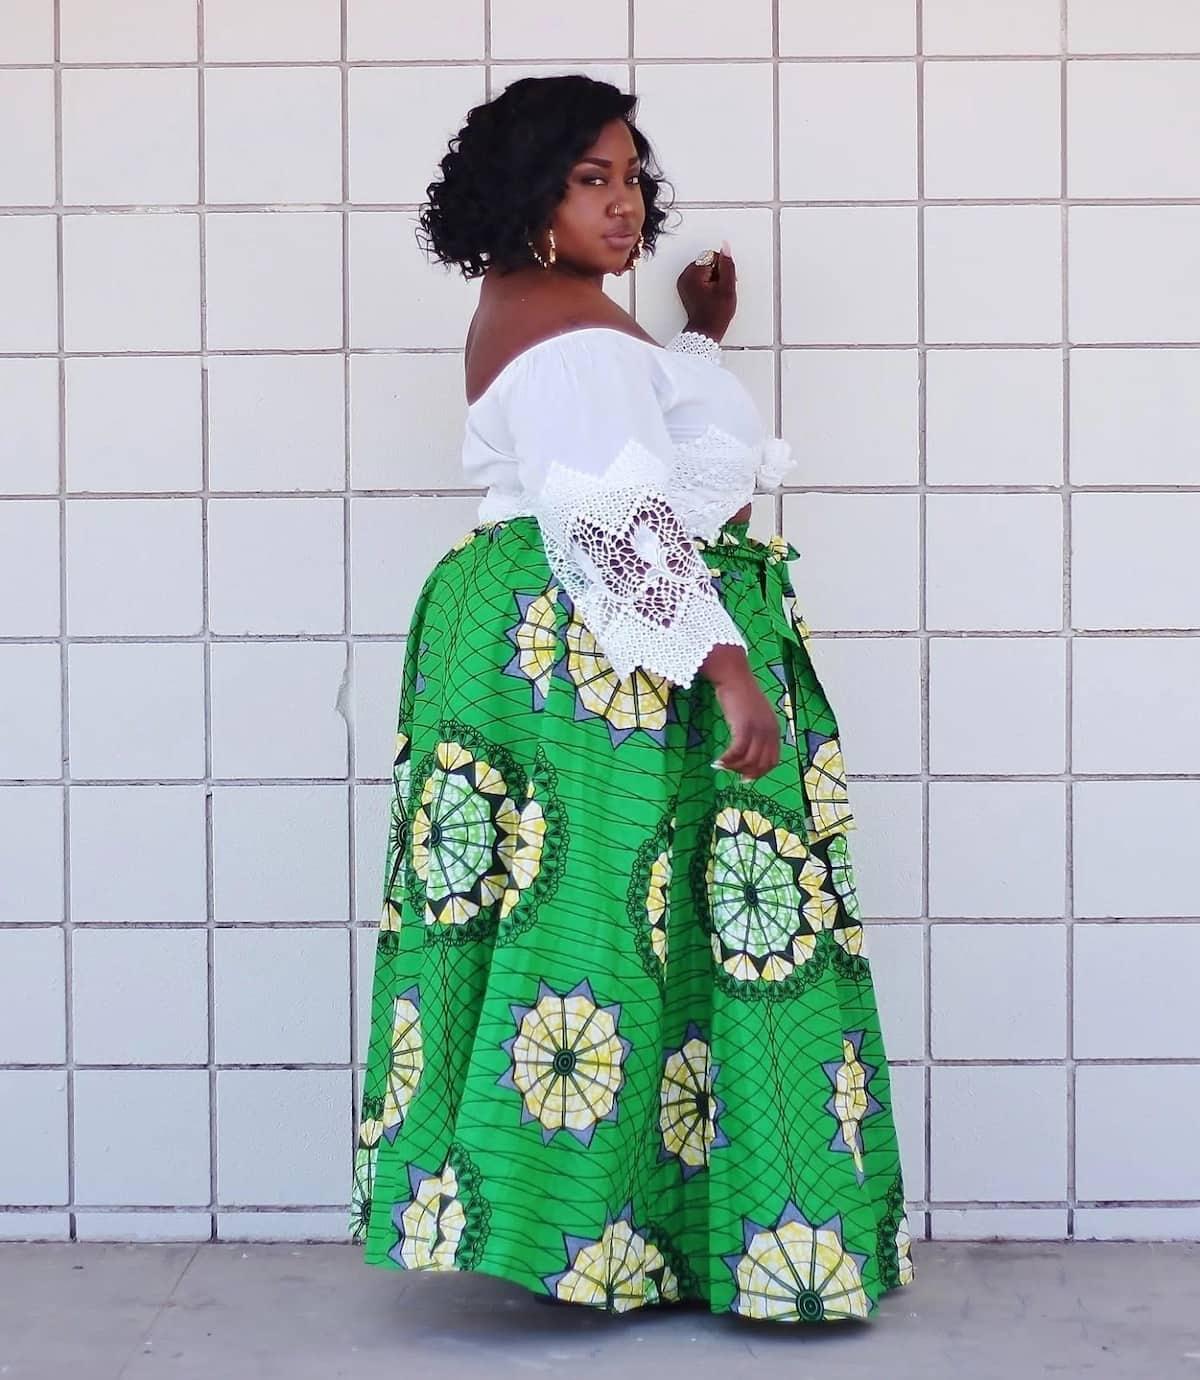 5ecc1636d06c43 2018 Trends Of African Print Dresses For Plus Size Ladies ▷ Tuko.co.ke